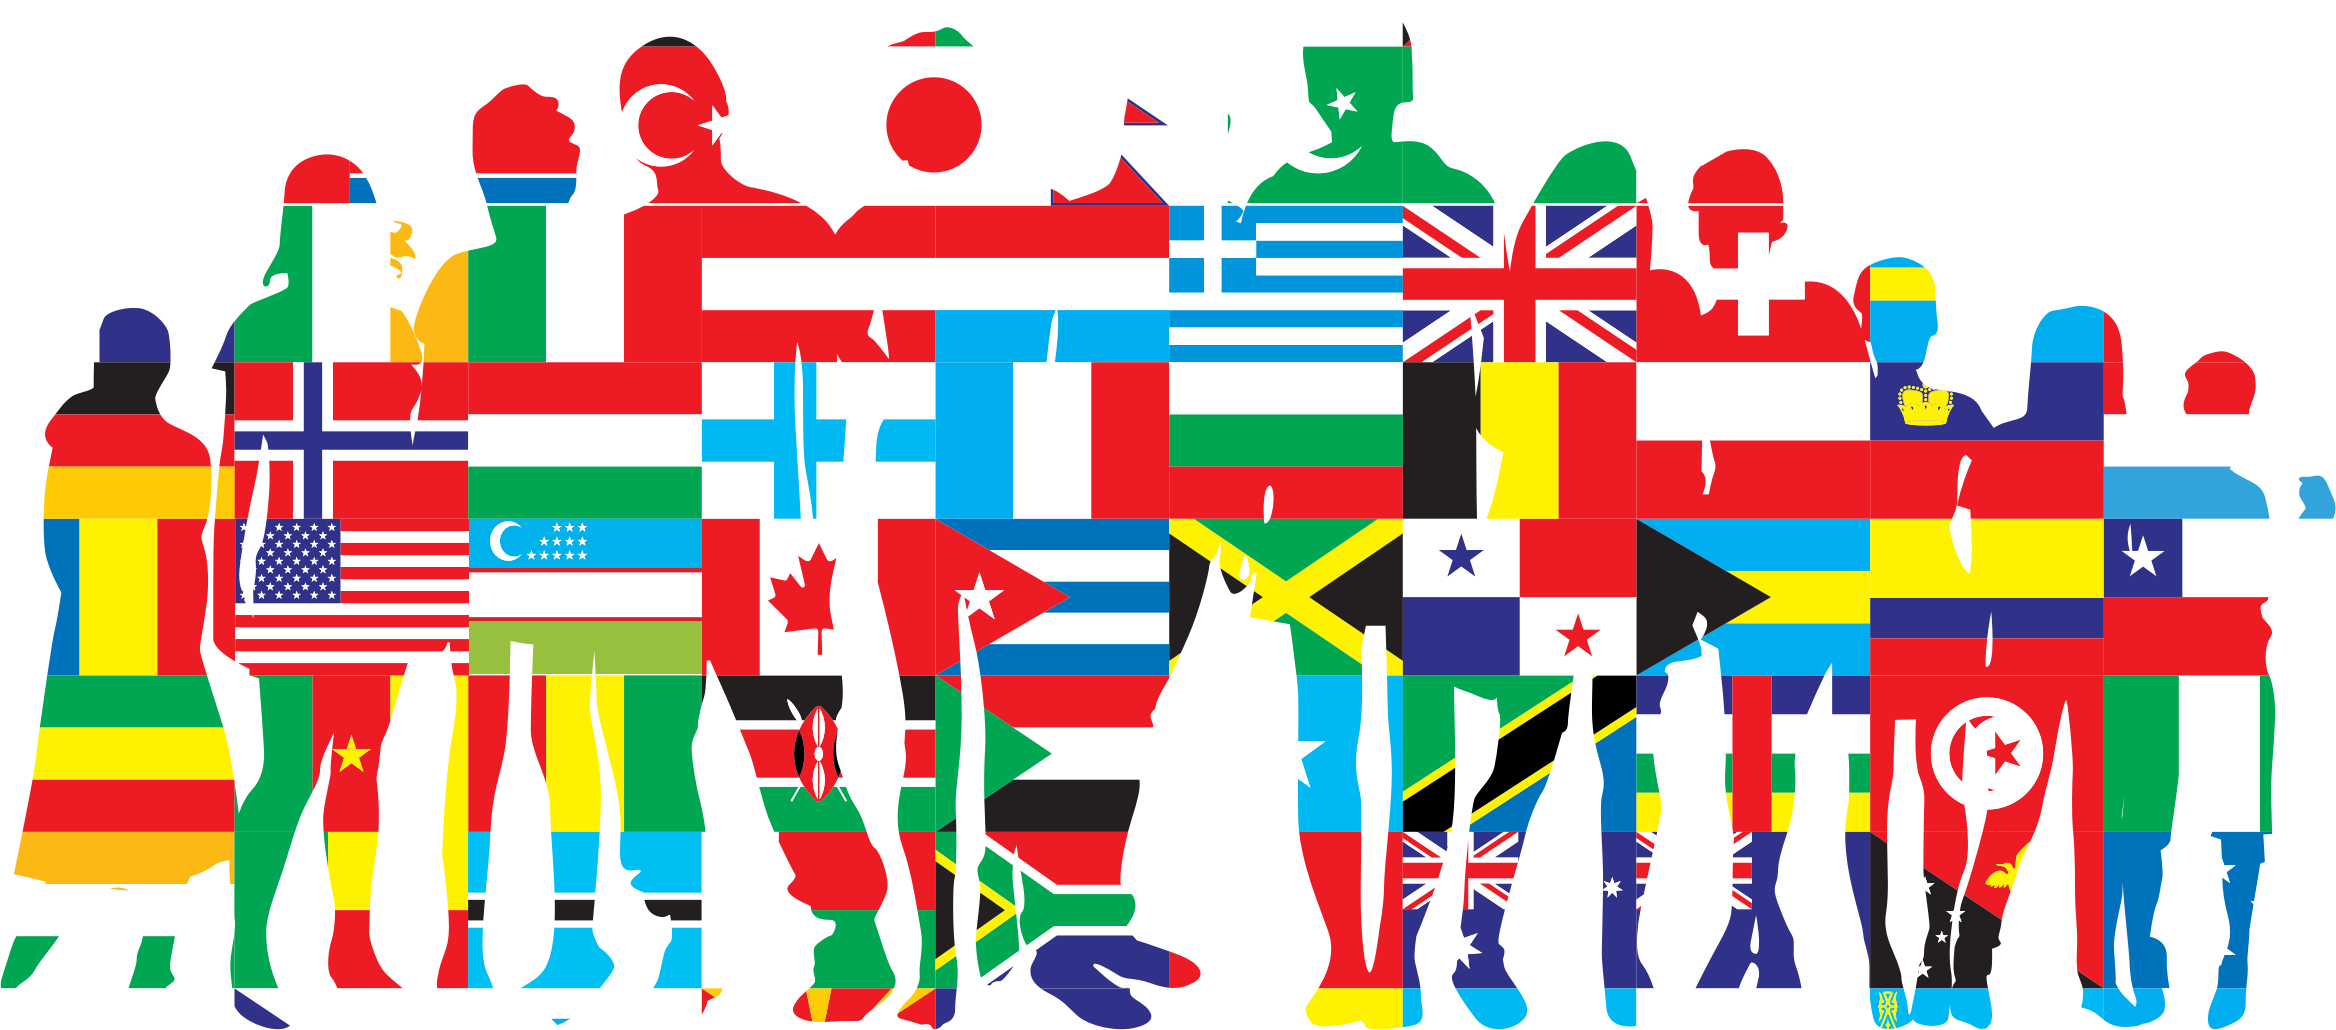 International no stroke icons. Human clipart human family